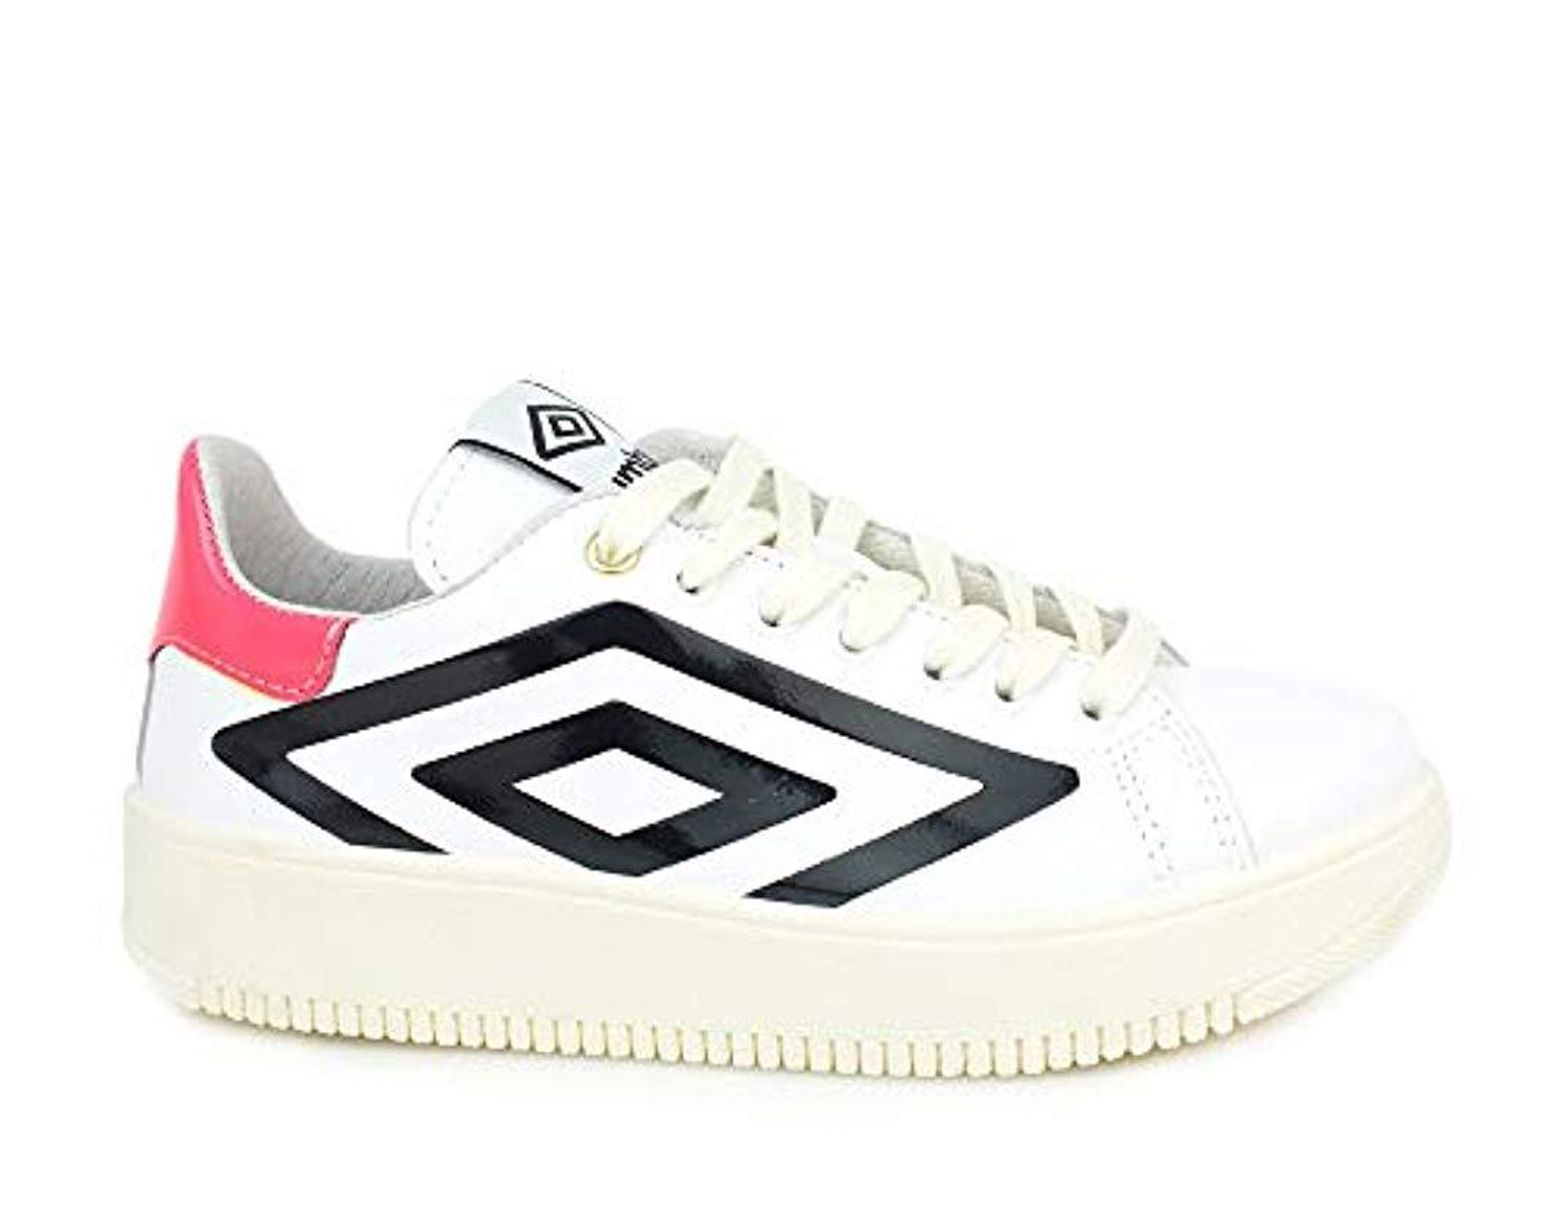 4284bca53b Umbro Sneaker Bianco Nero Rosa Rfp37021s - Lyst